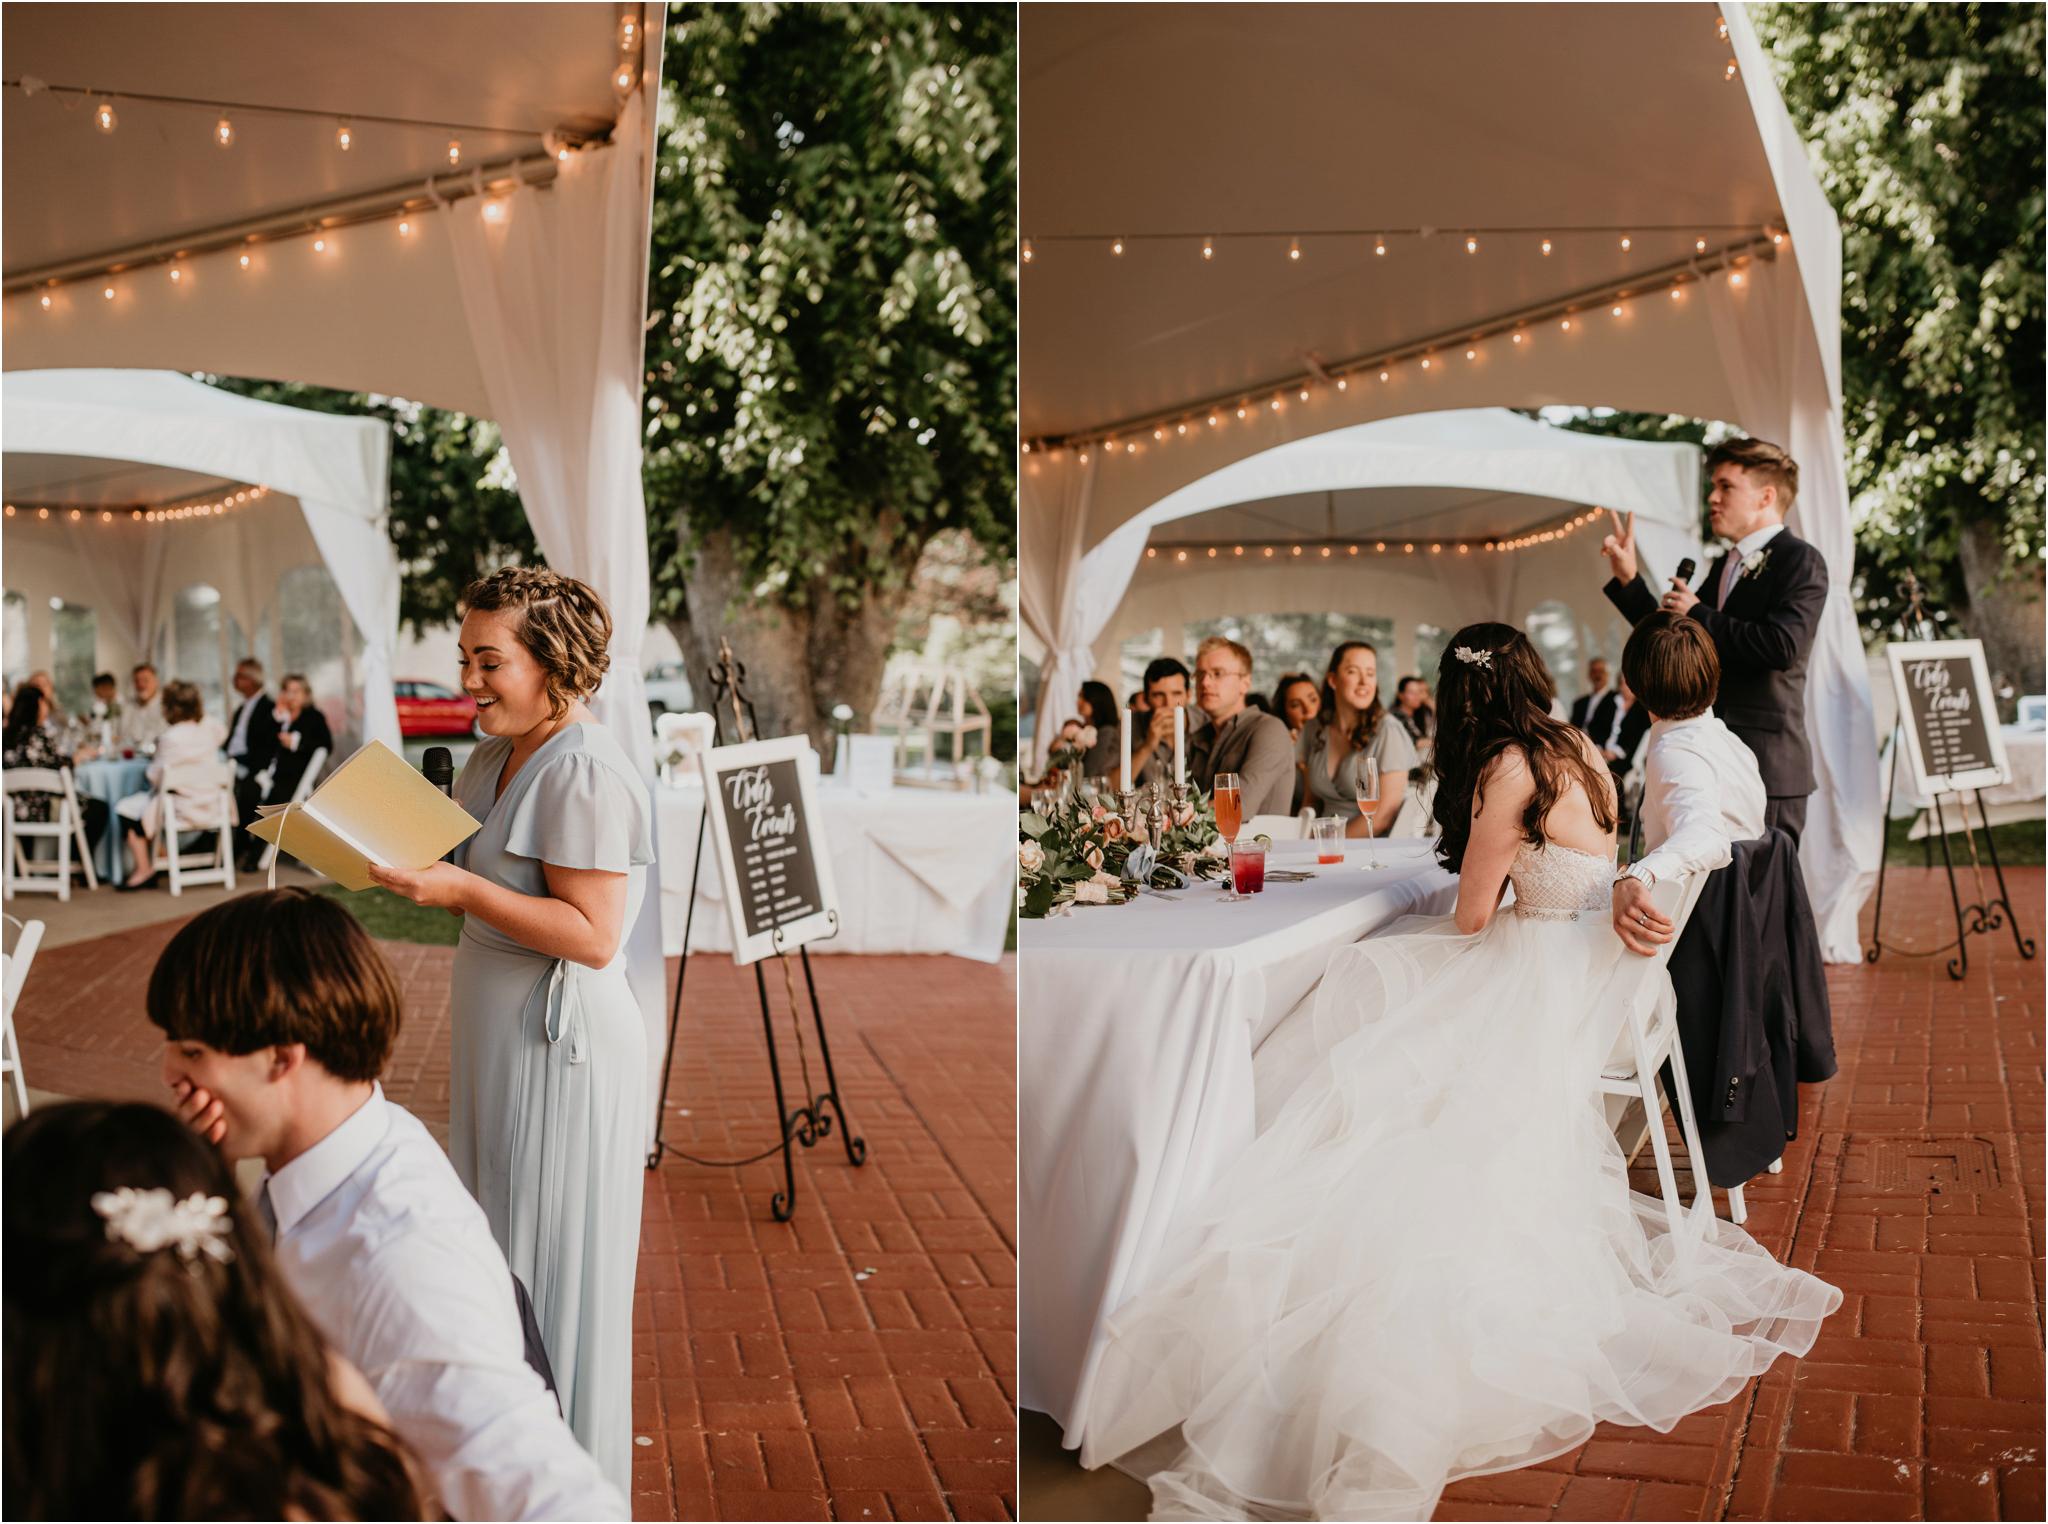 chance-and-ondrea-lairmont-manor-wedding-seattle-photographer-096.jpg